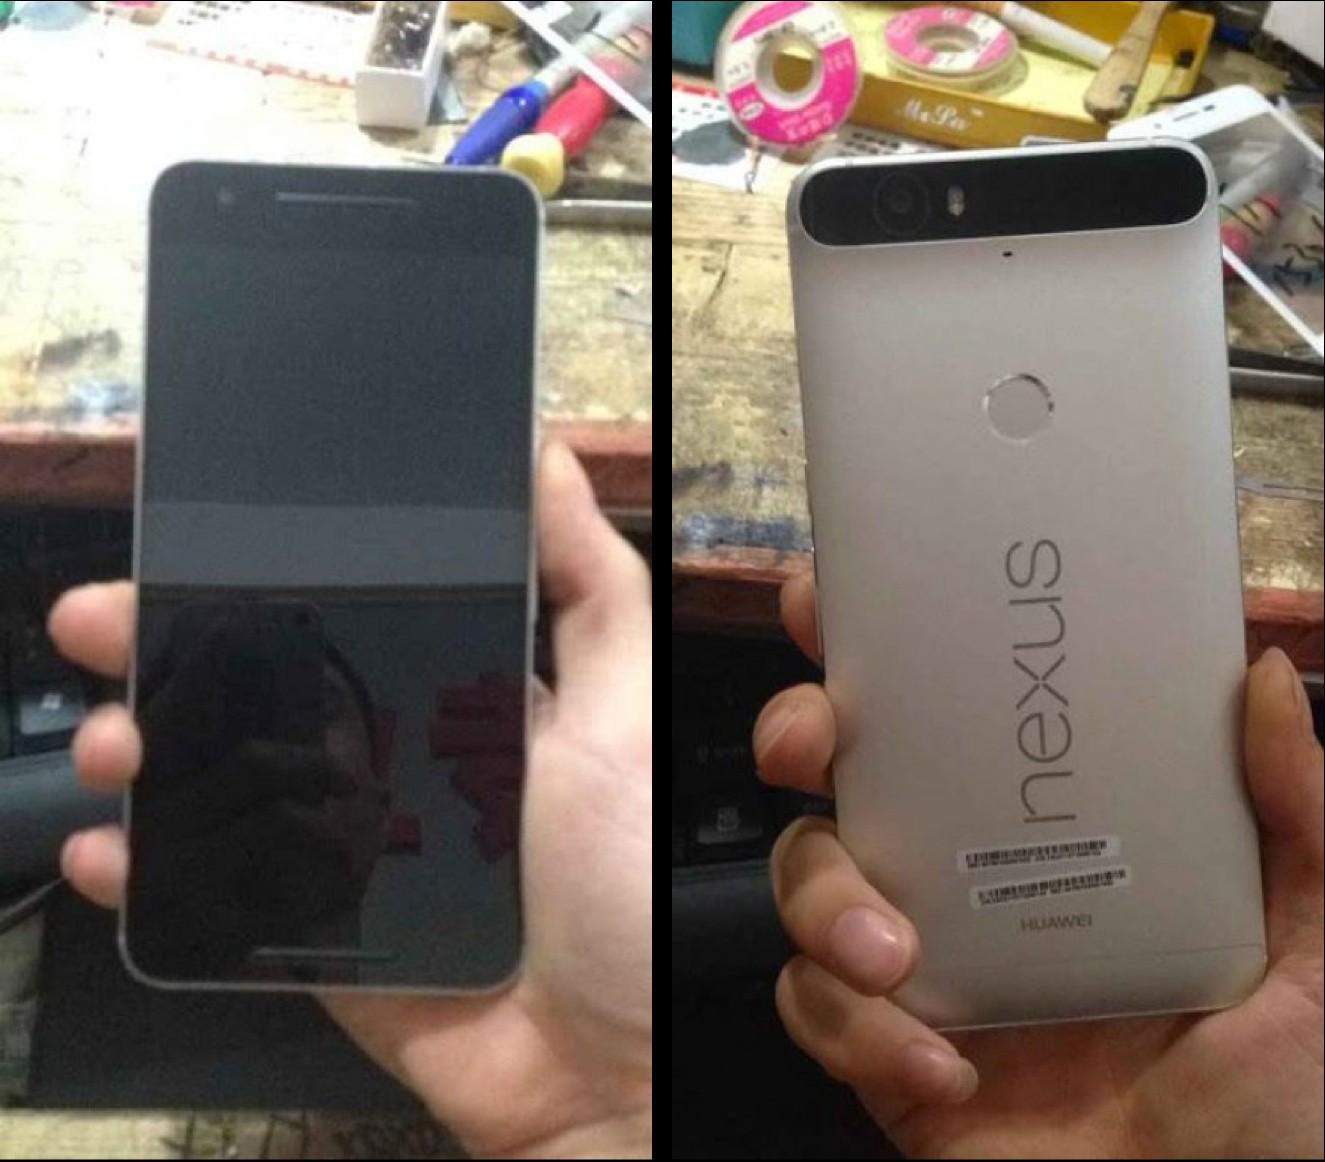 Huawei Nexus 6 - Huawei Nexus 6 bất ngờ lộ ảnh thật